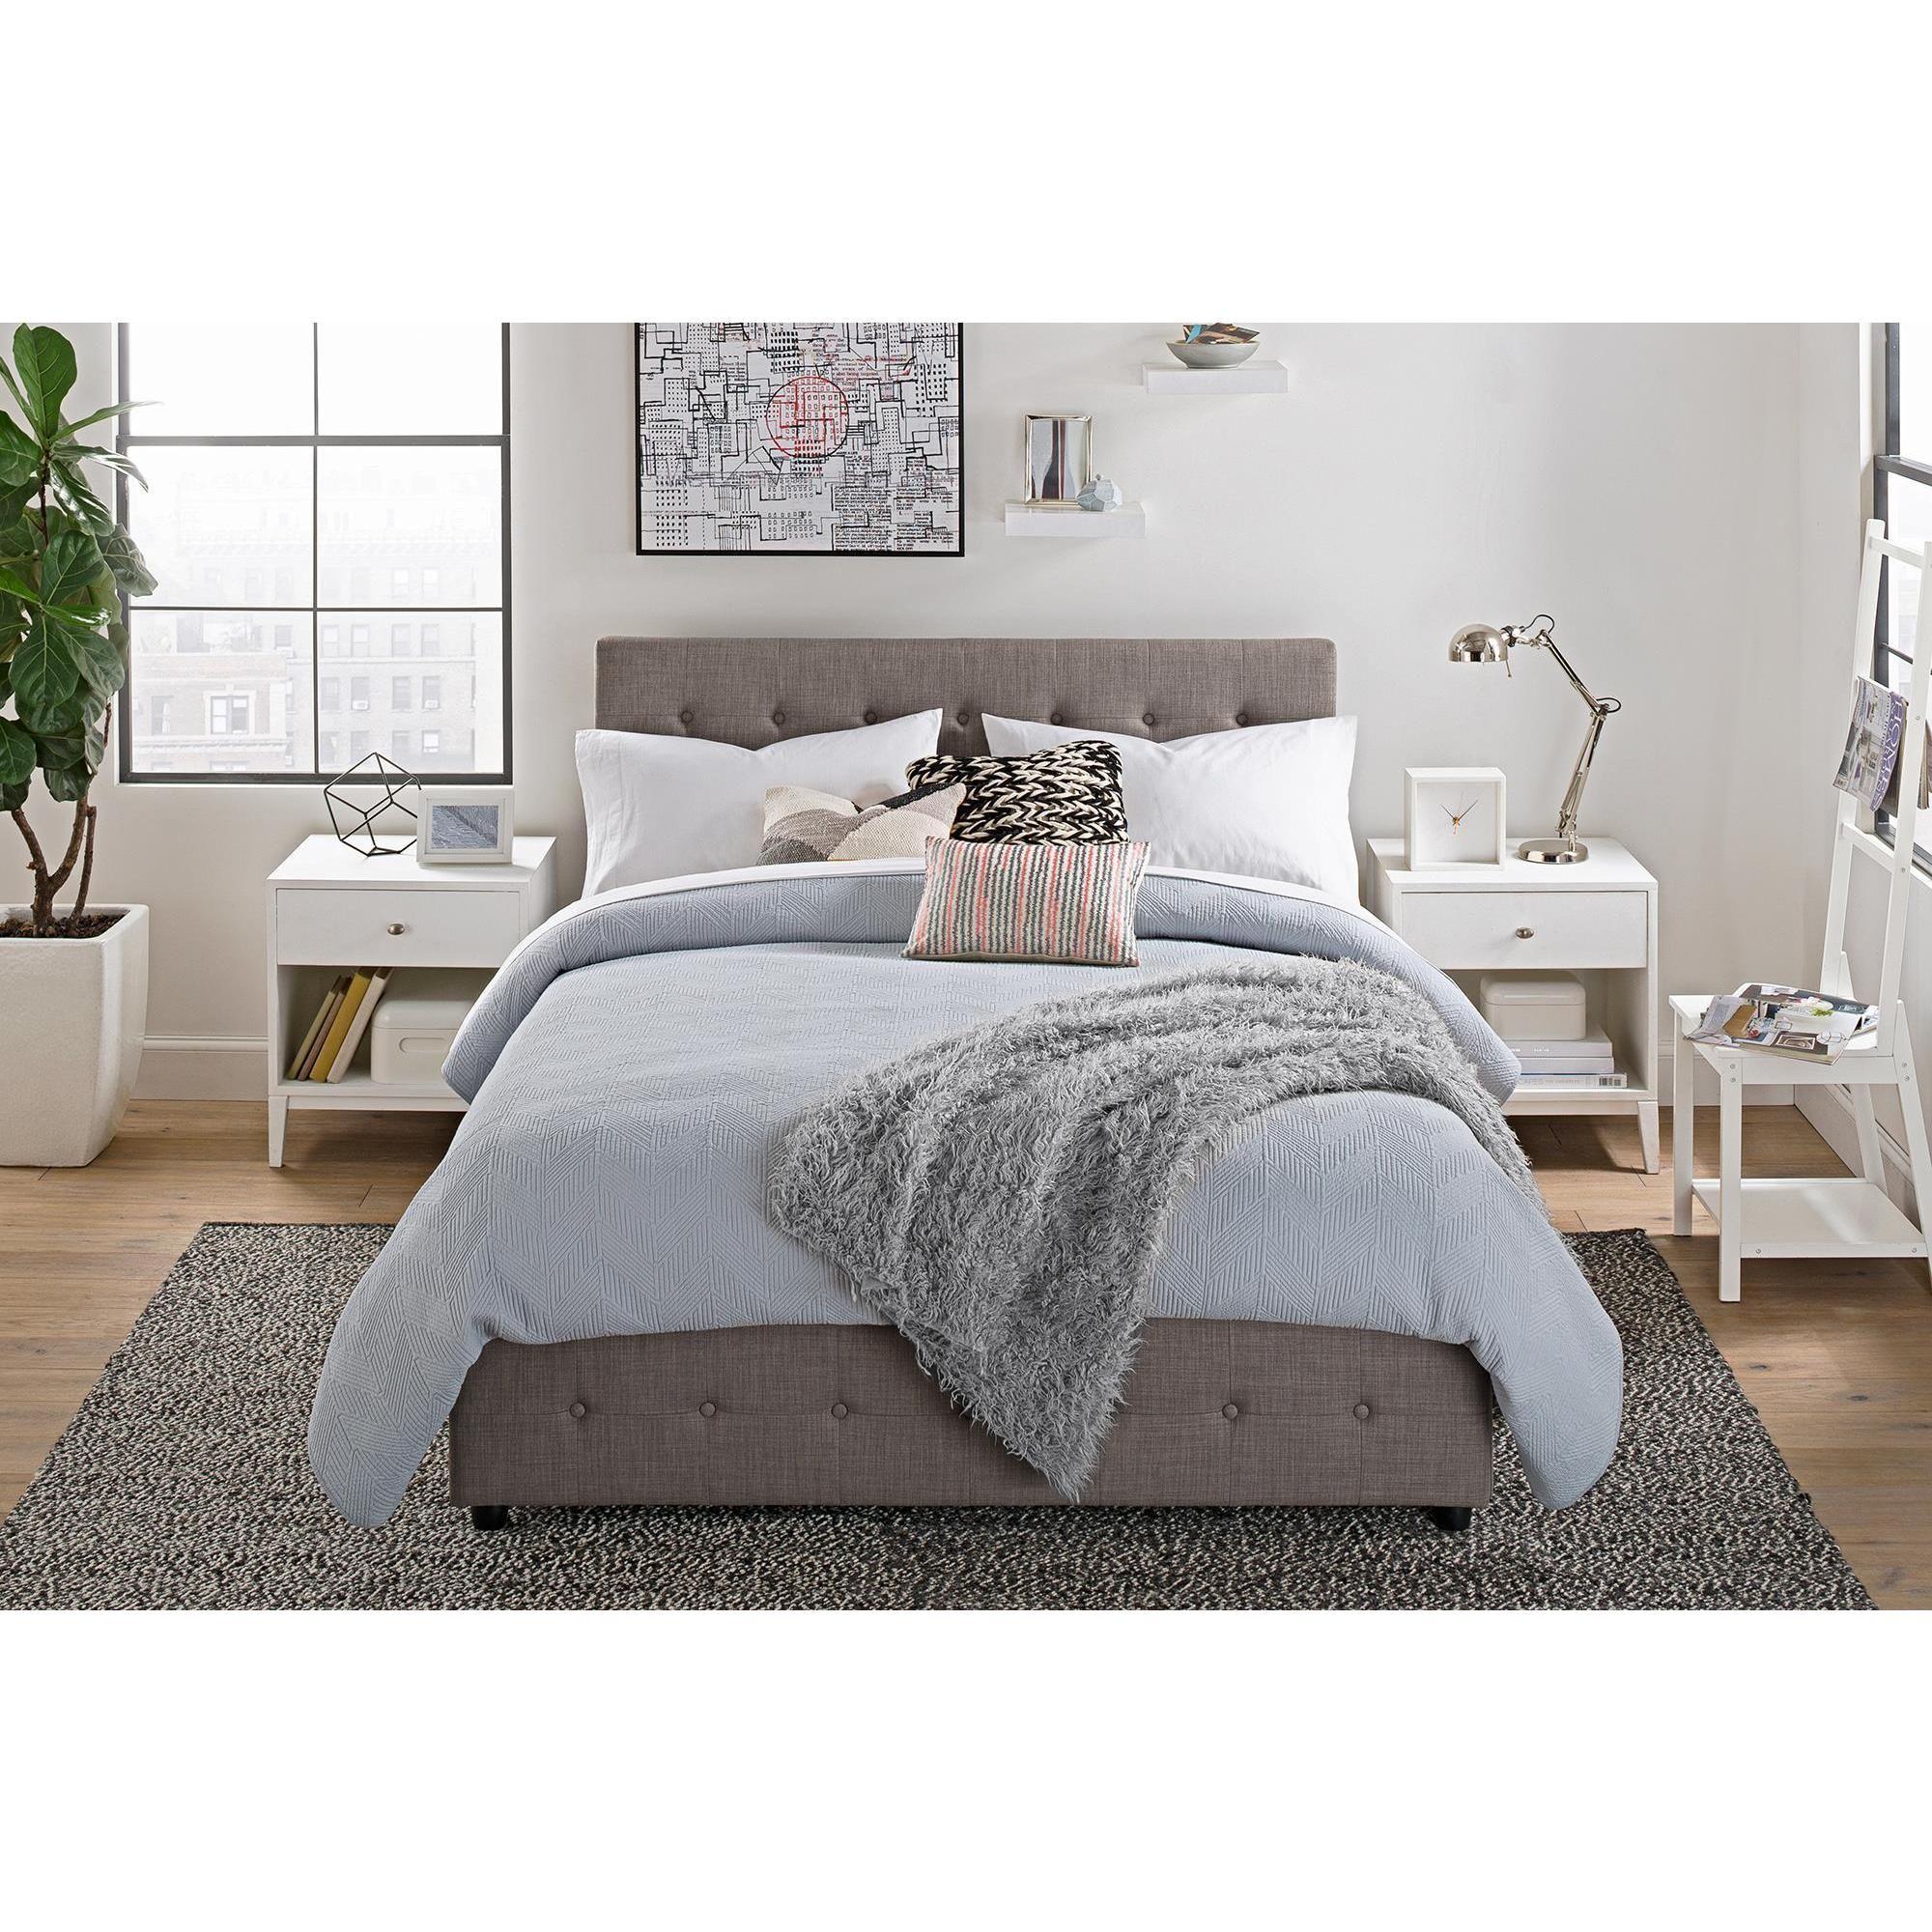 dhp cambridge grey linen upholstered bed with storage home sweet home upholstered beds. Black Bedroom Furniture Sets. Home Design Ideas